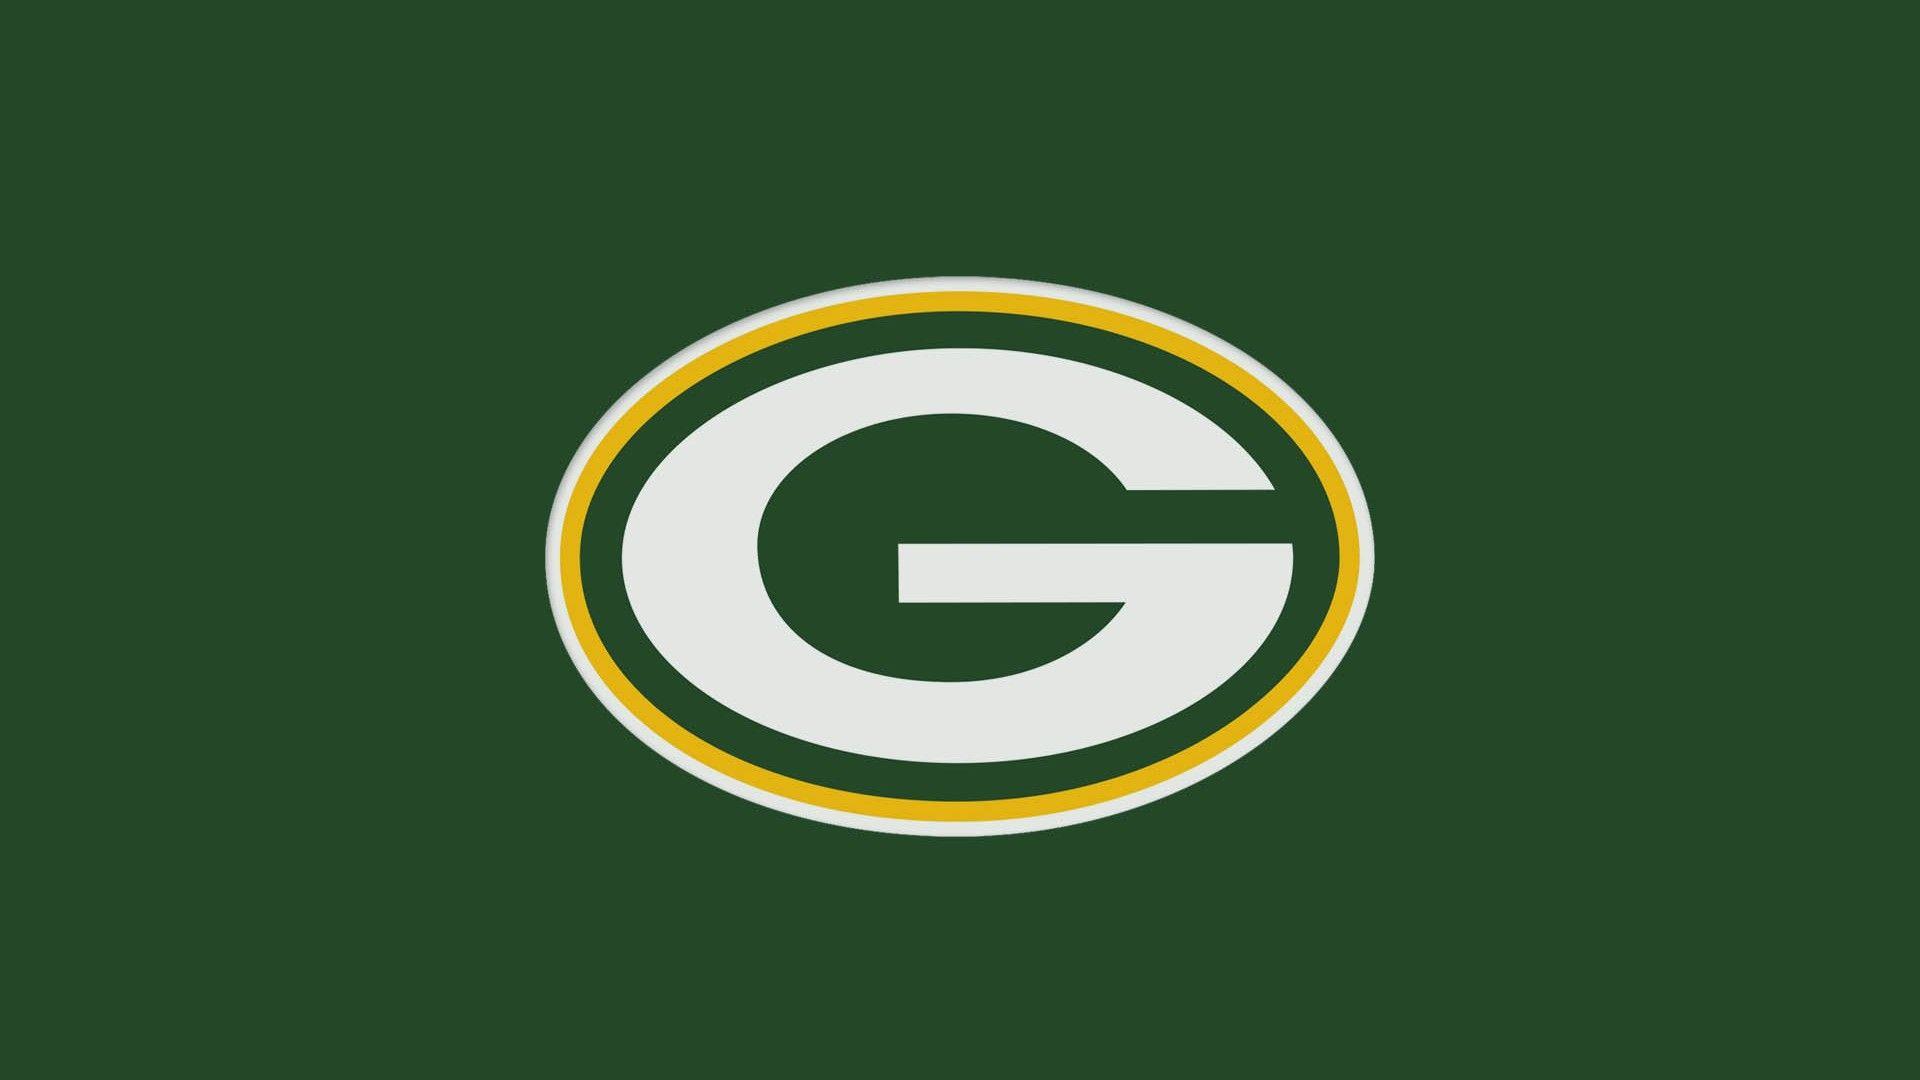 Windows Wallpaper Green Bay Packers Nfl Football Wallpaper Windows Wallpaper Football Wallpaper